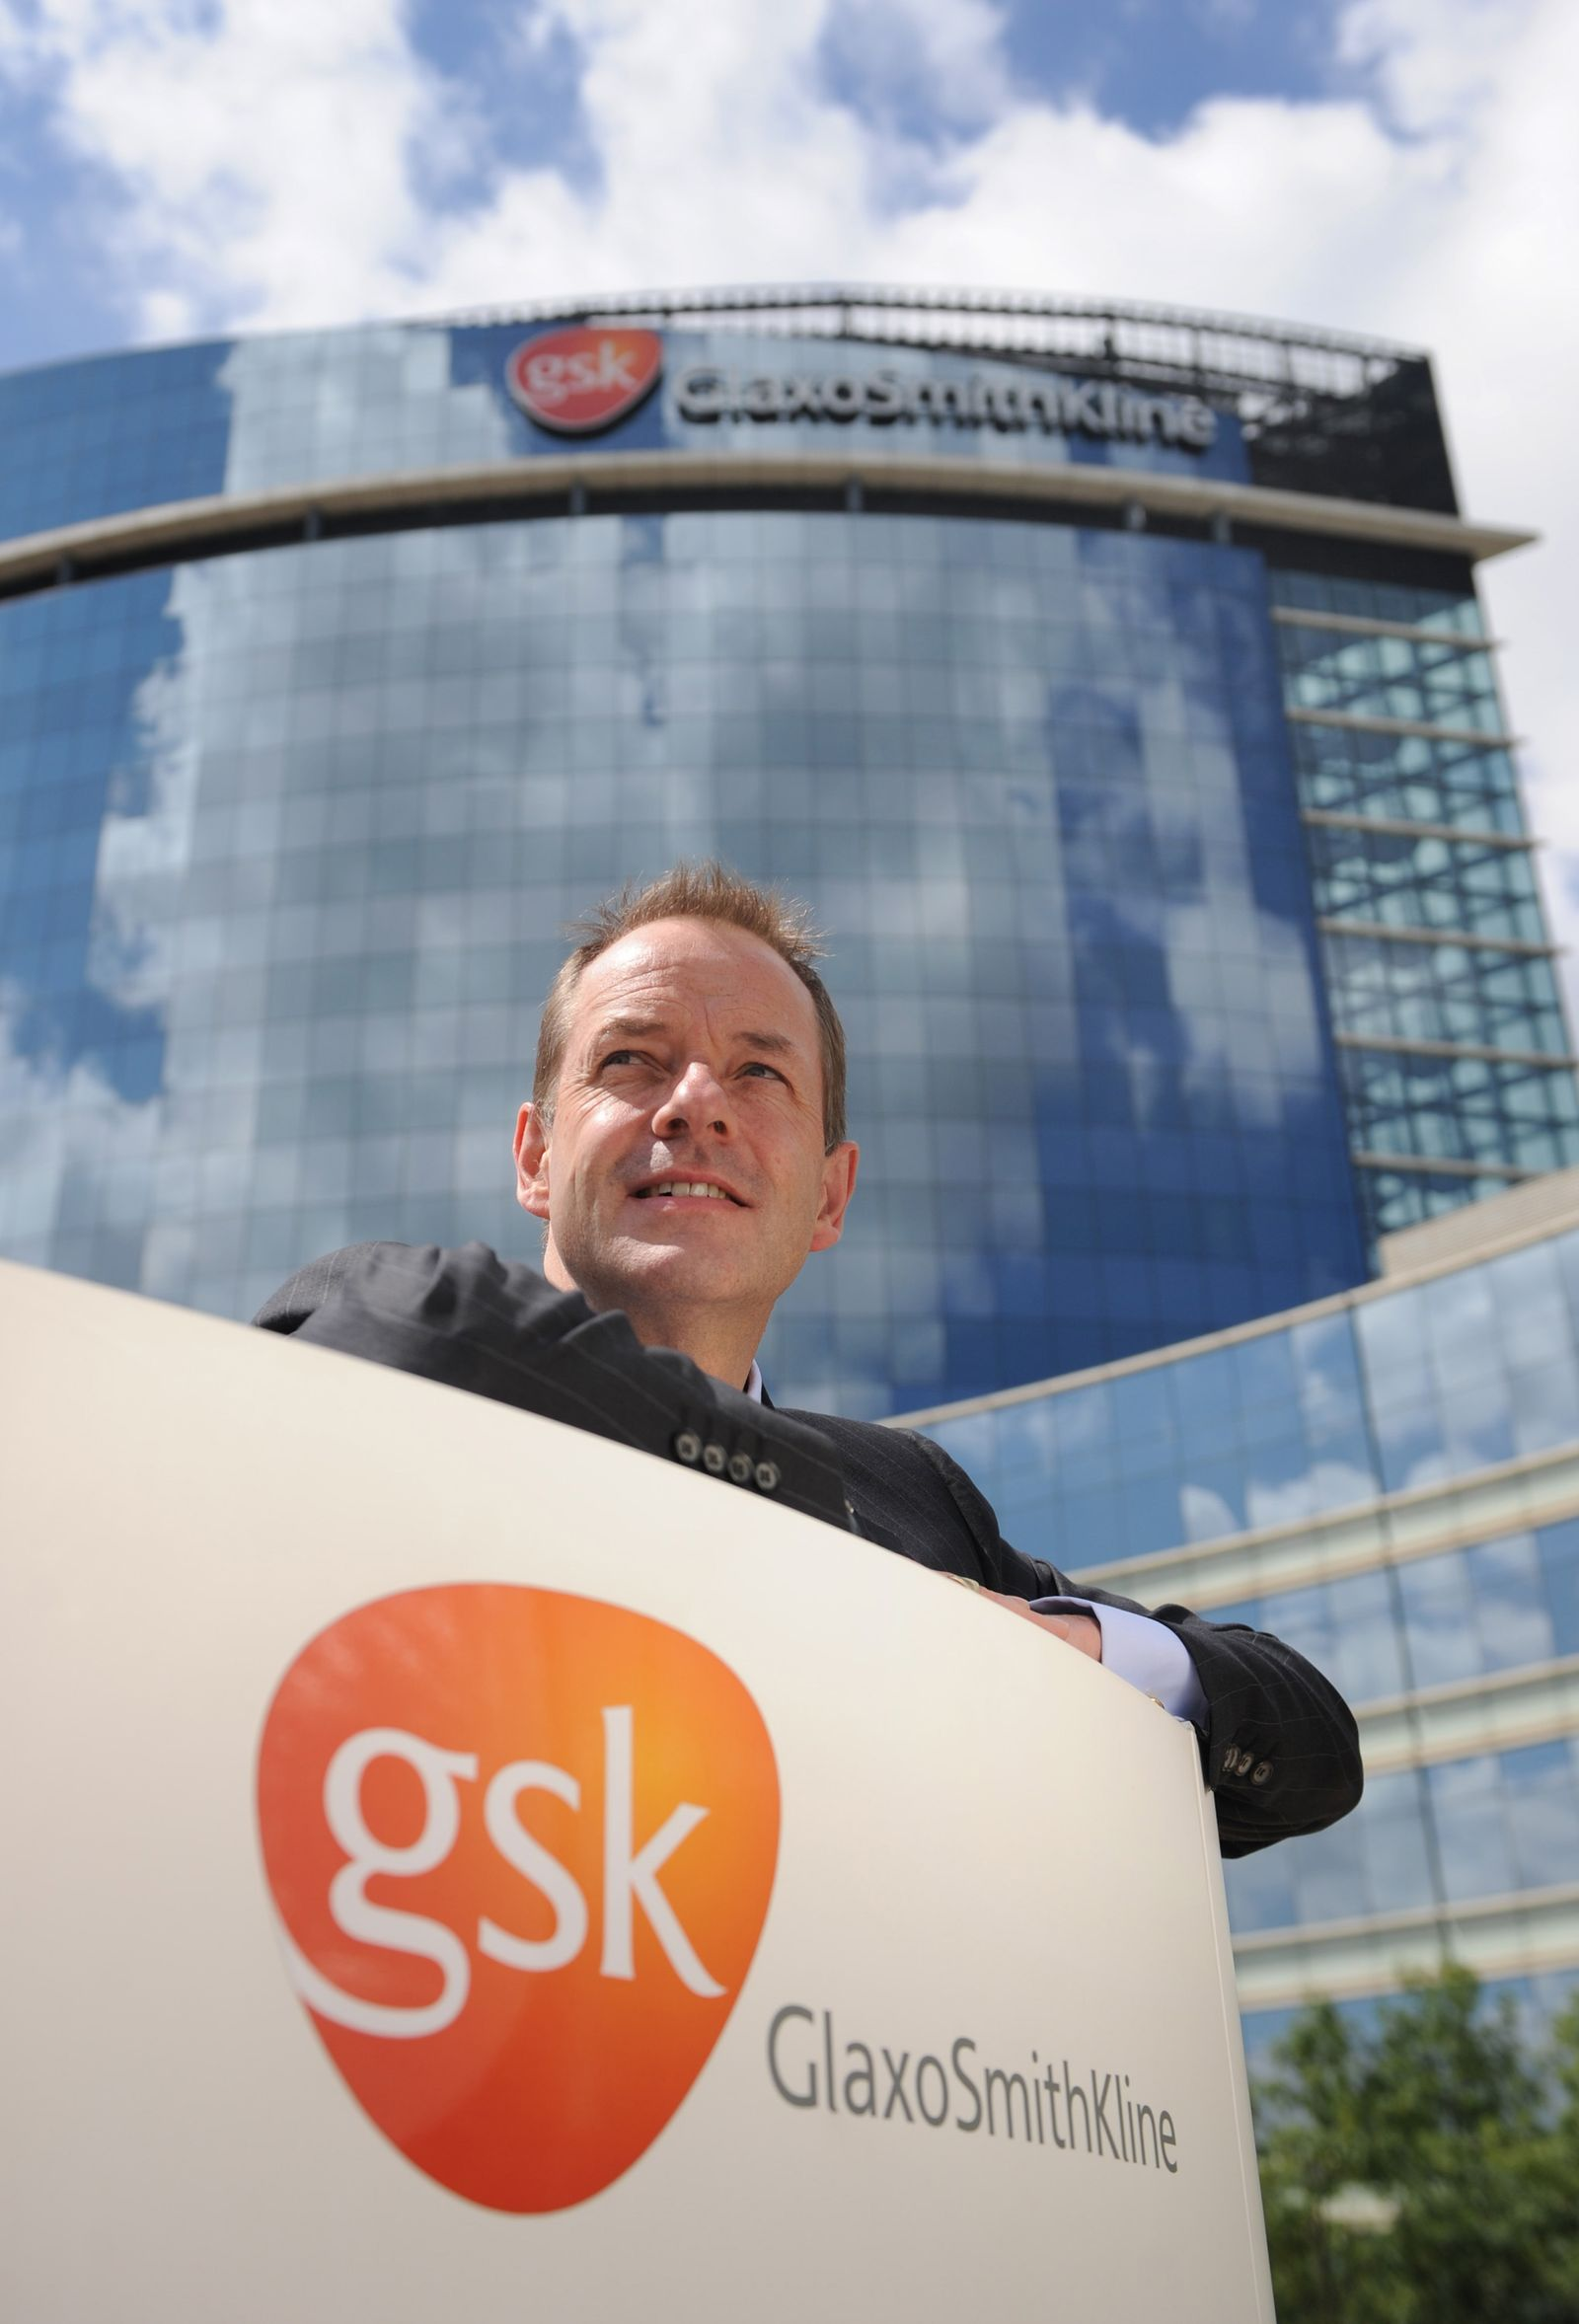 GSK / GlaxoSmithKline / Andrew Witty